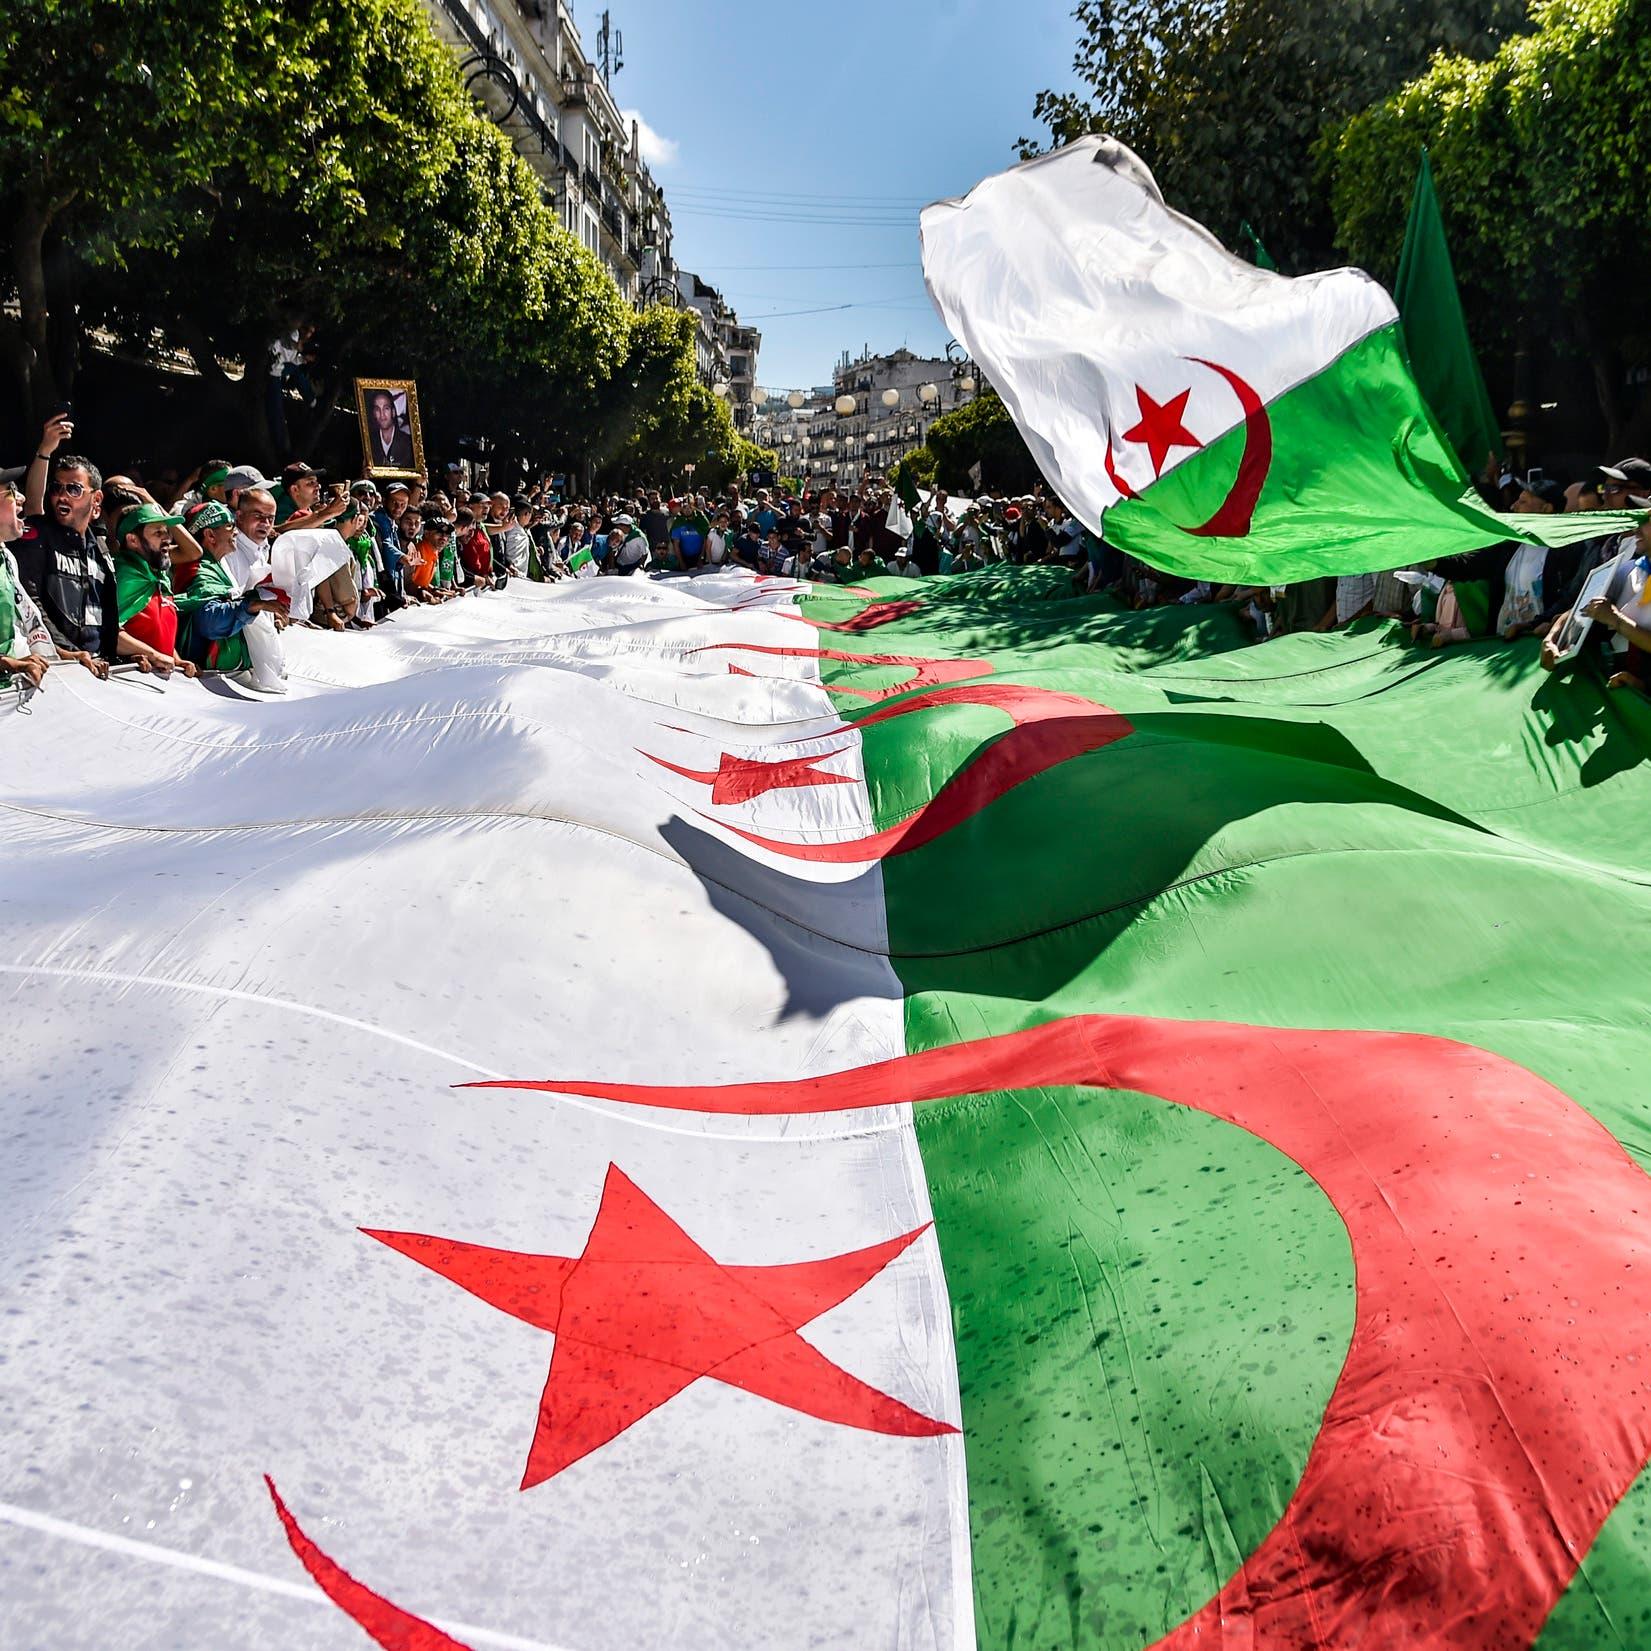 Algerian journalist sentenced to six months' jail for 'defamation'